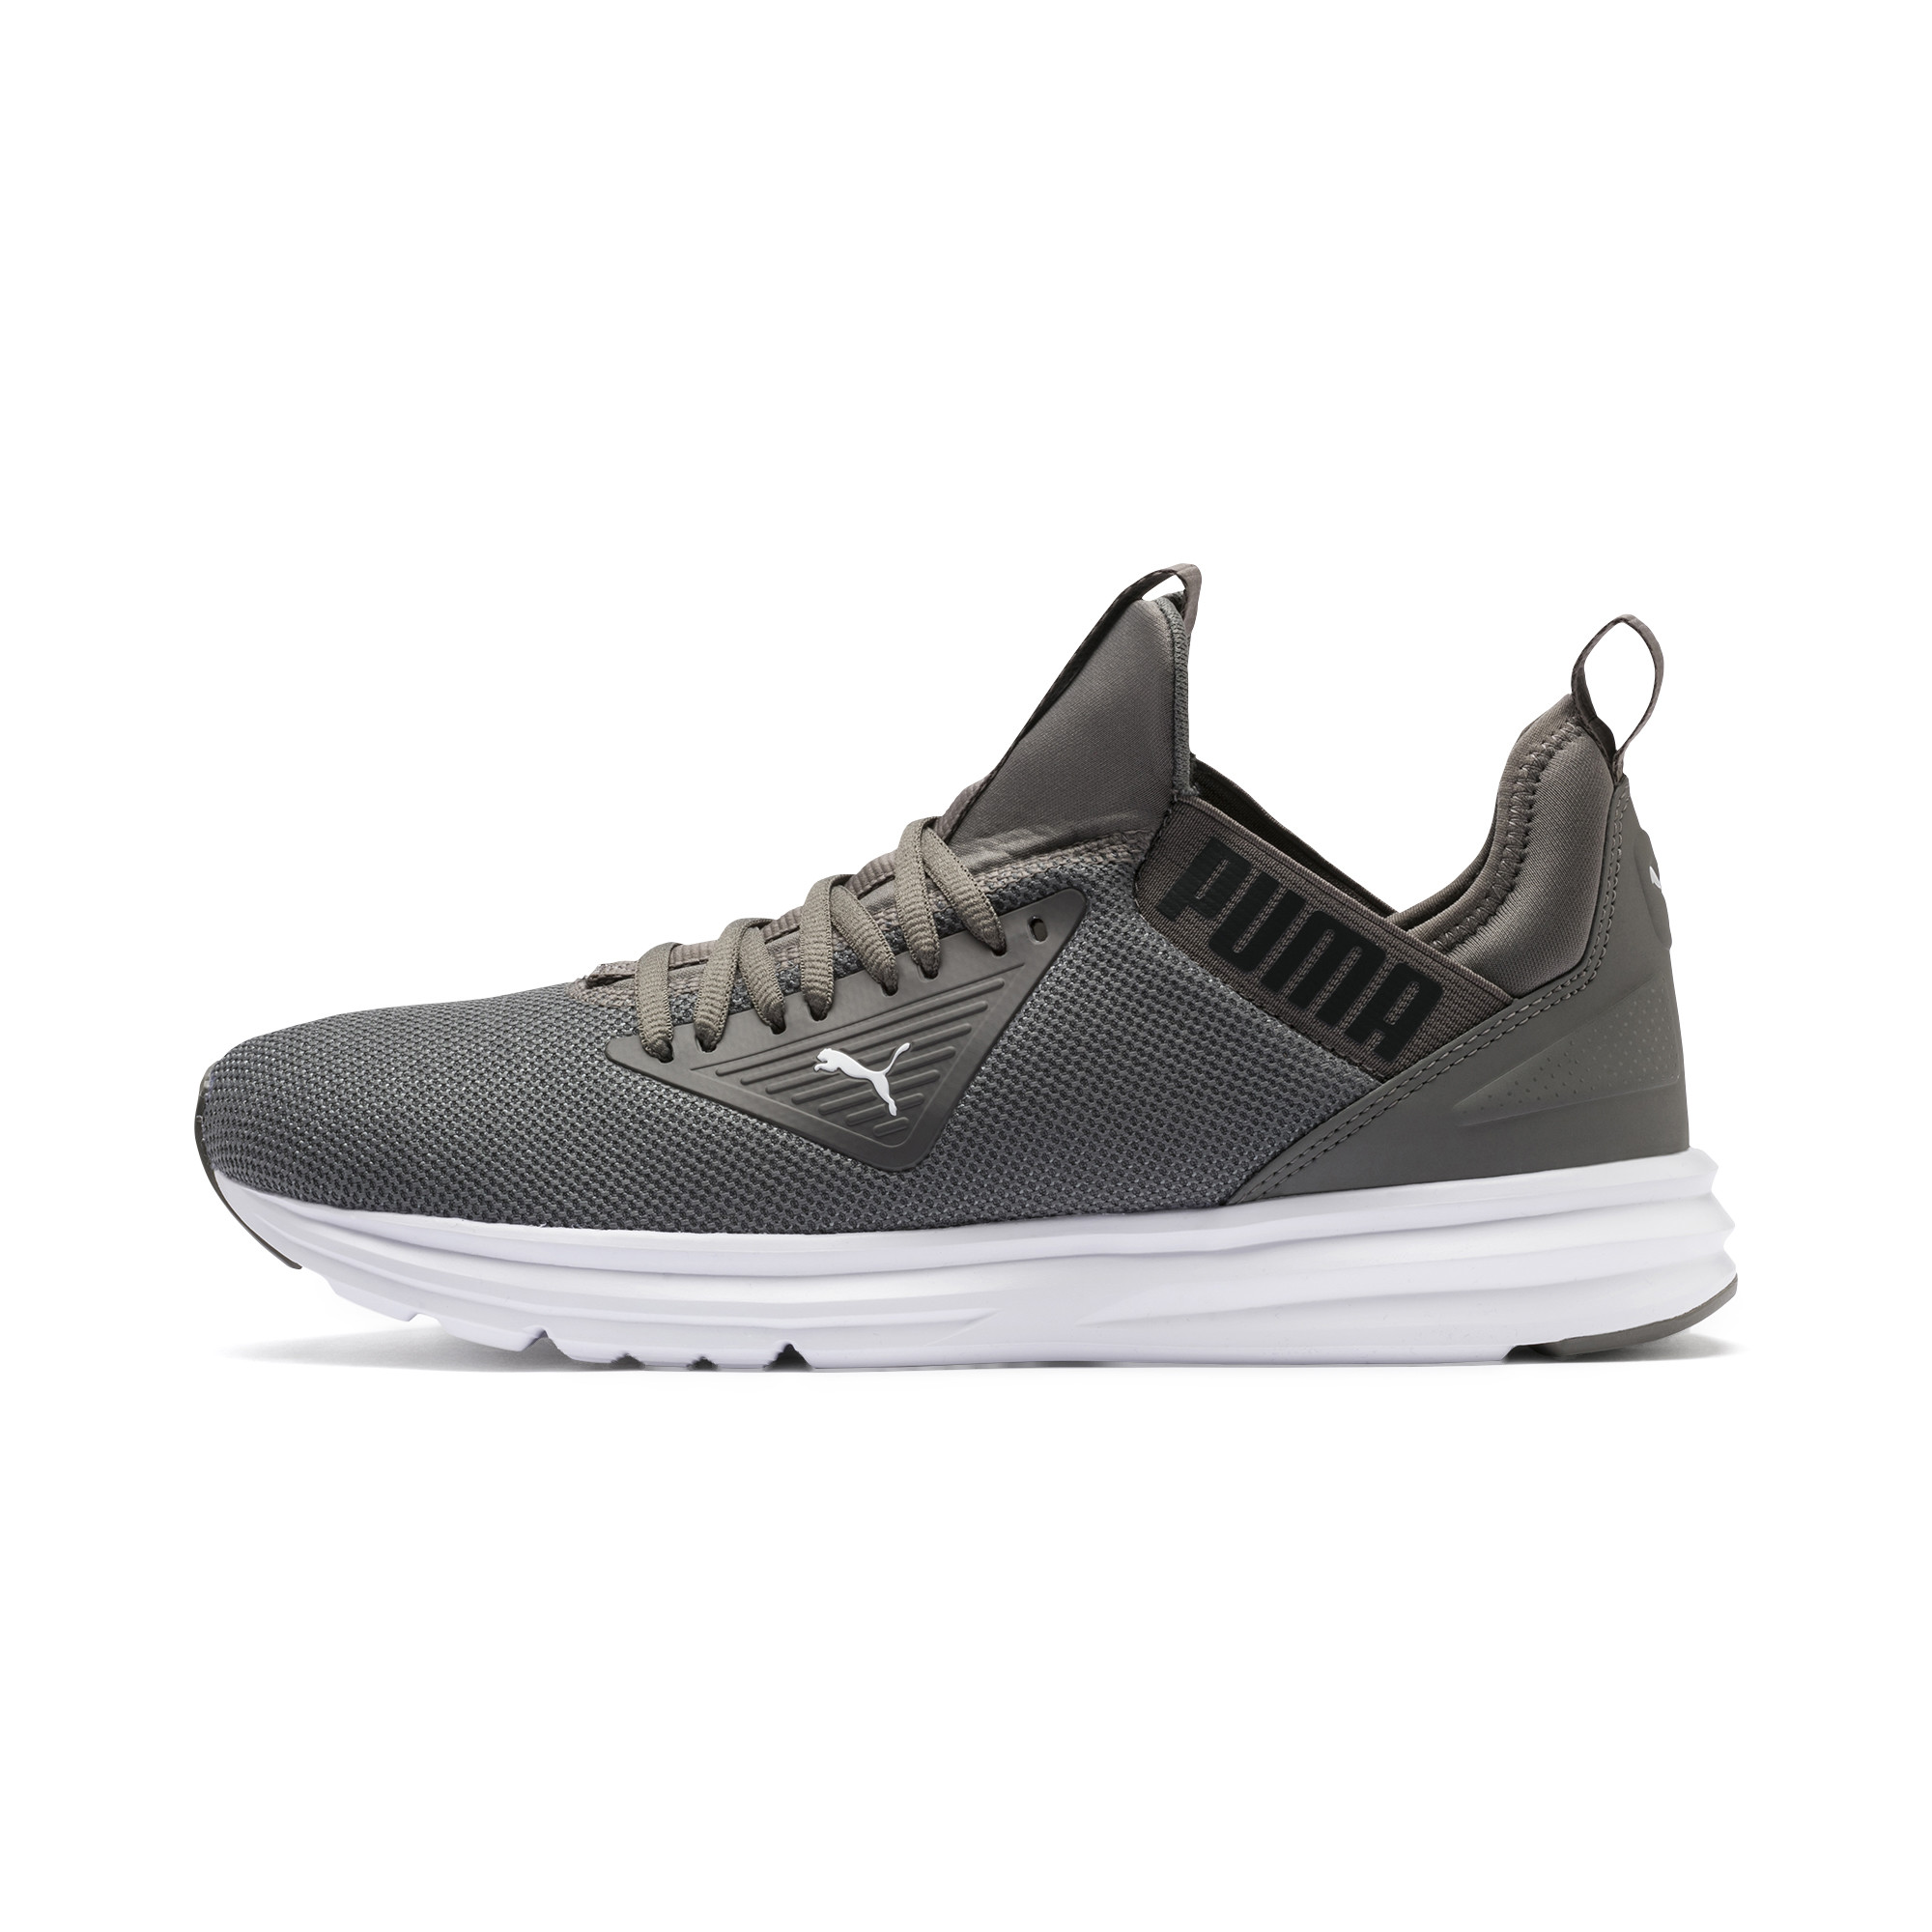 Details zu PUMA Enzo Beta Herren Sneaker Männer Schuhe Laufen Neu